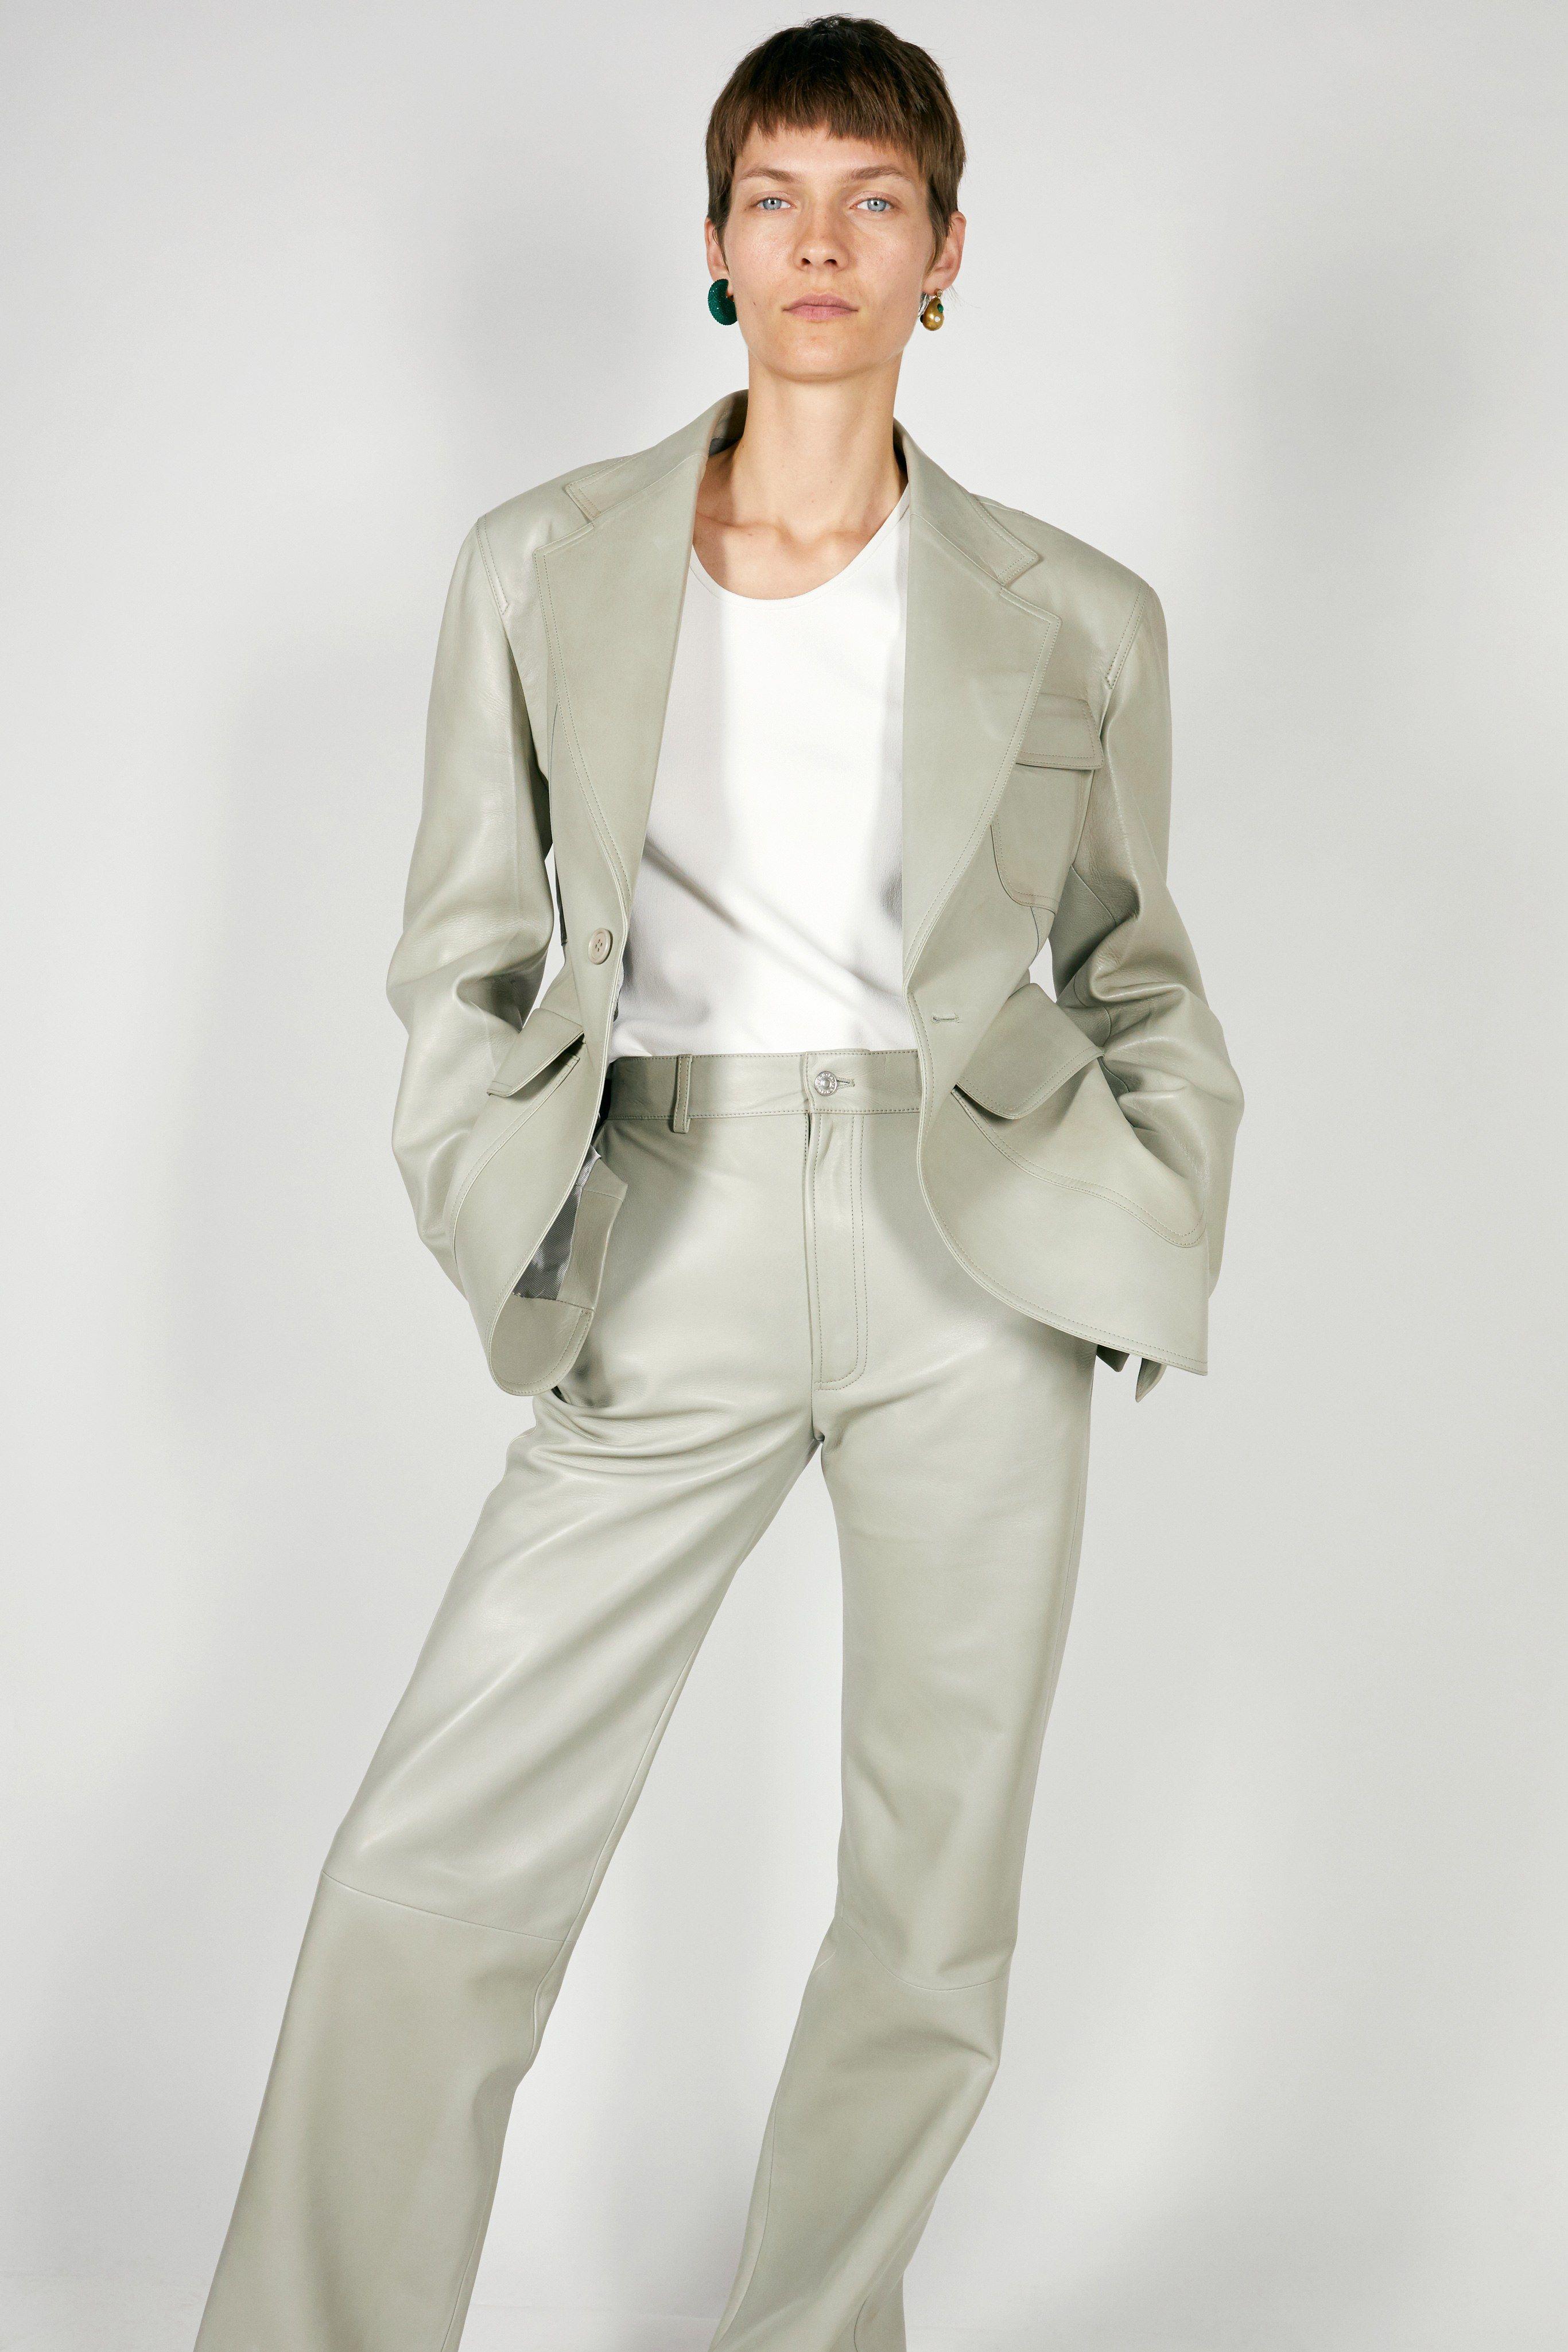 e63e330c016460 Céline Pre-Fall 2018 Collection - Vogue